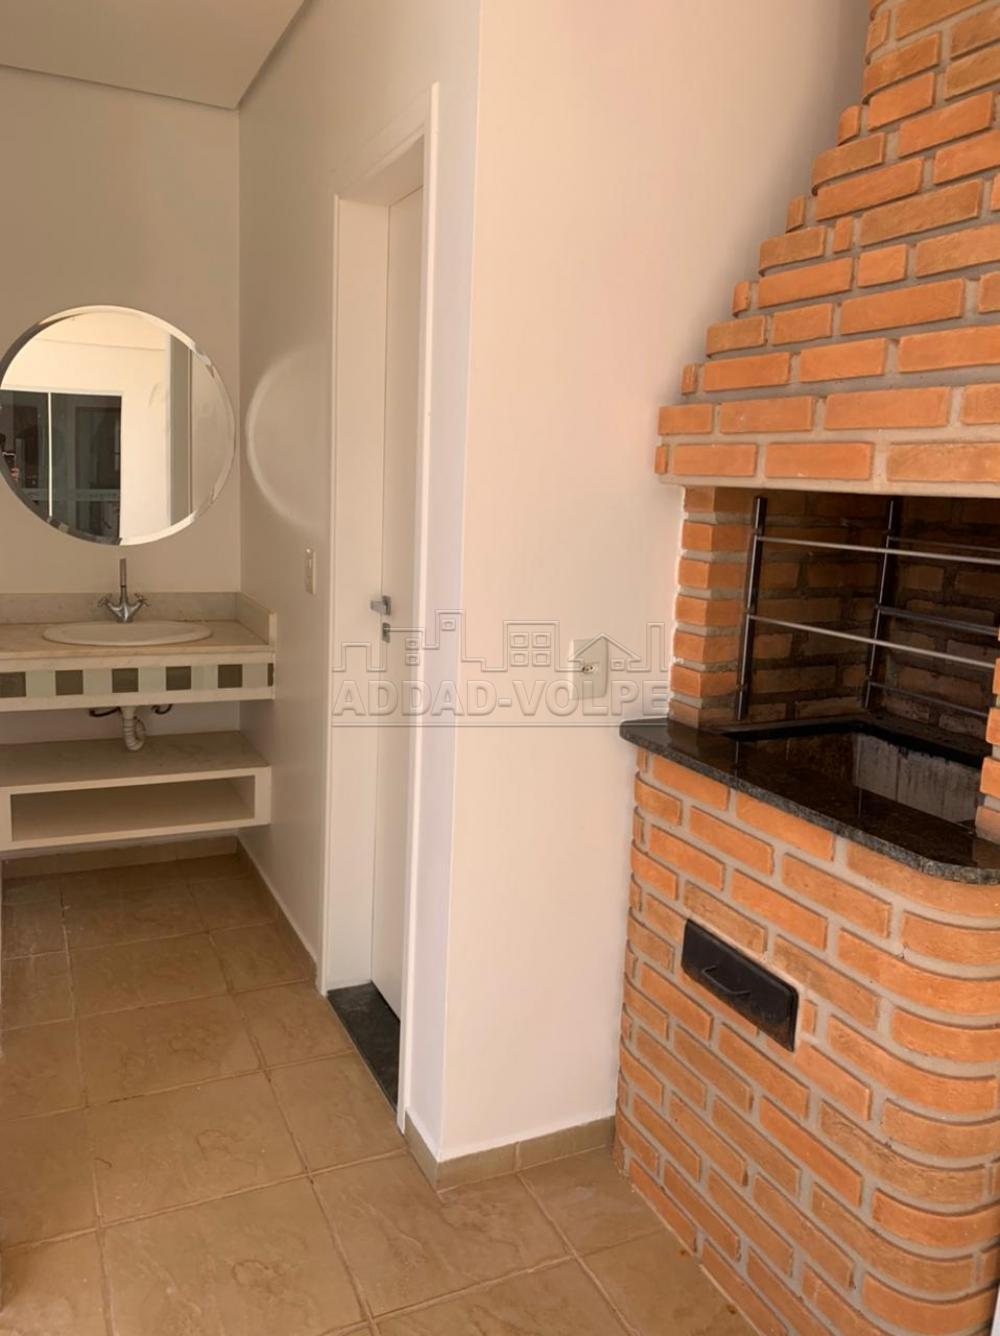 Alugar Casa / Condomínio em Bauru R$ 6.500,00 - Foto 17